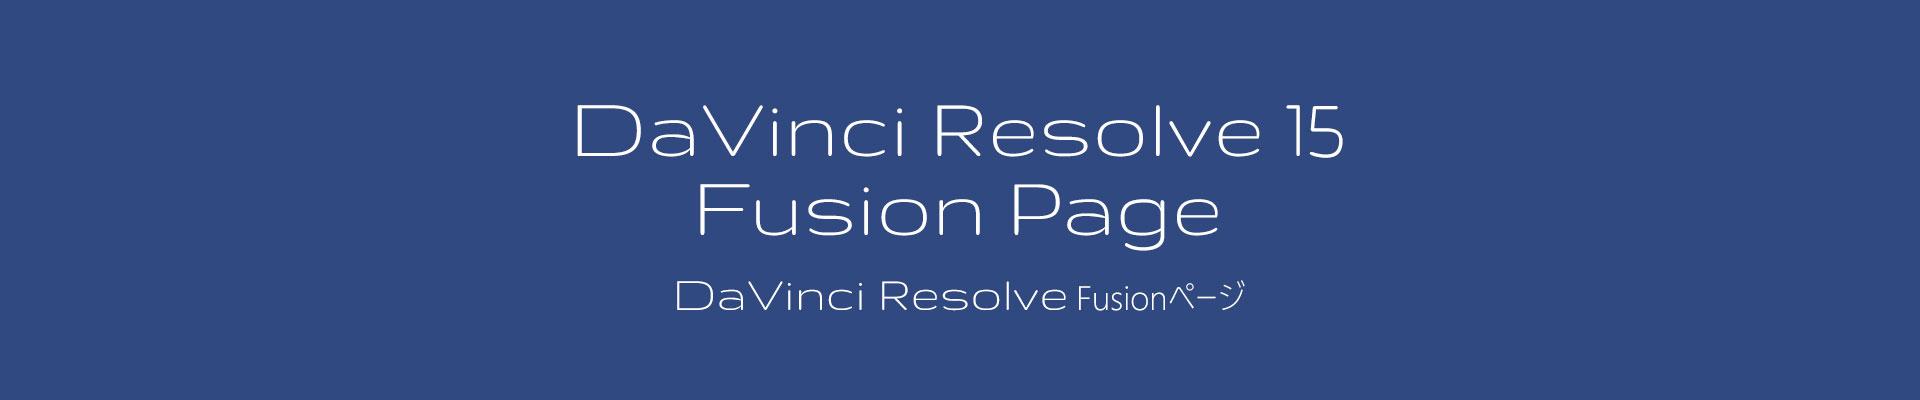 DaVinciResolve15 Fusion Page